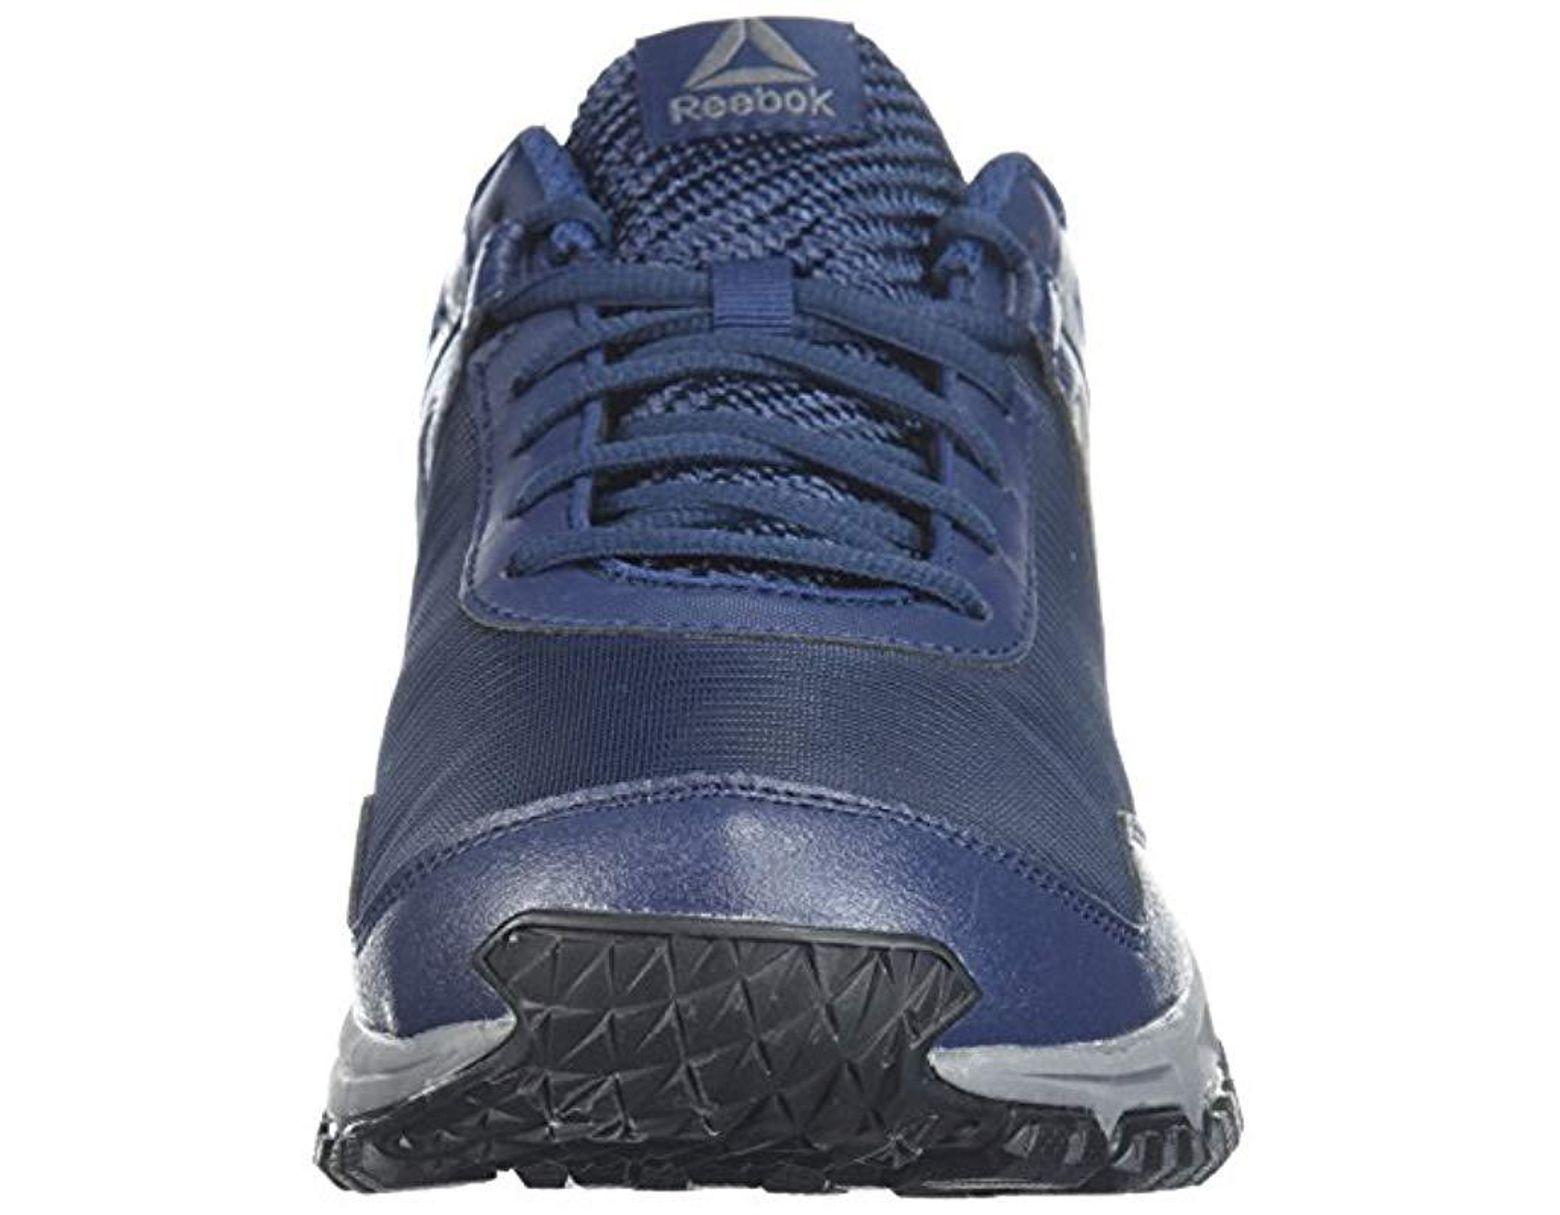 fbe3f211bb2b8 Men's Blue Ridgerider Trail 3.0 Walking Shoe